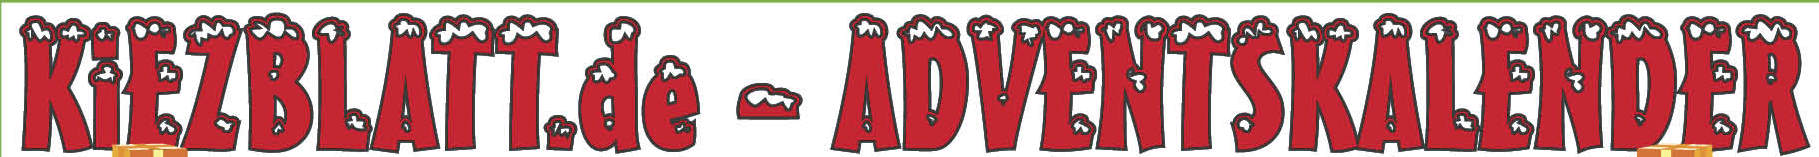 141-wp-16-kiezblatt-adventskalender-logo